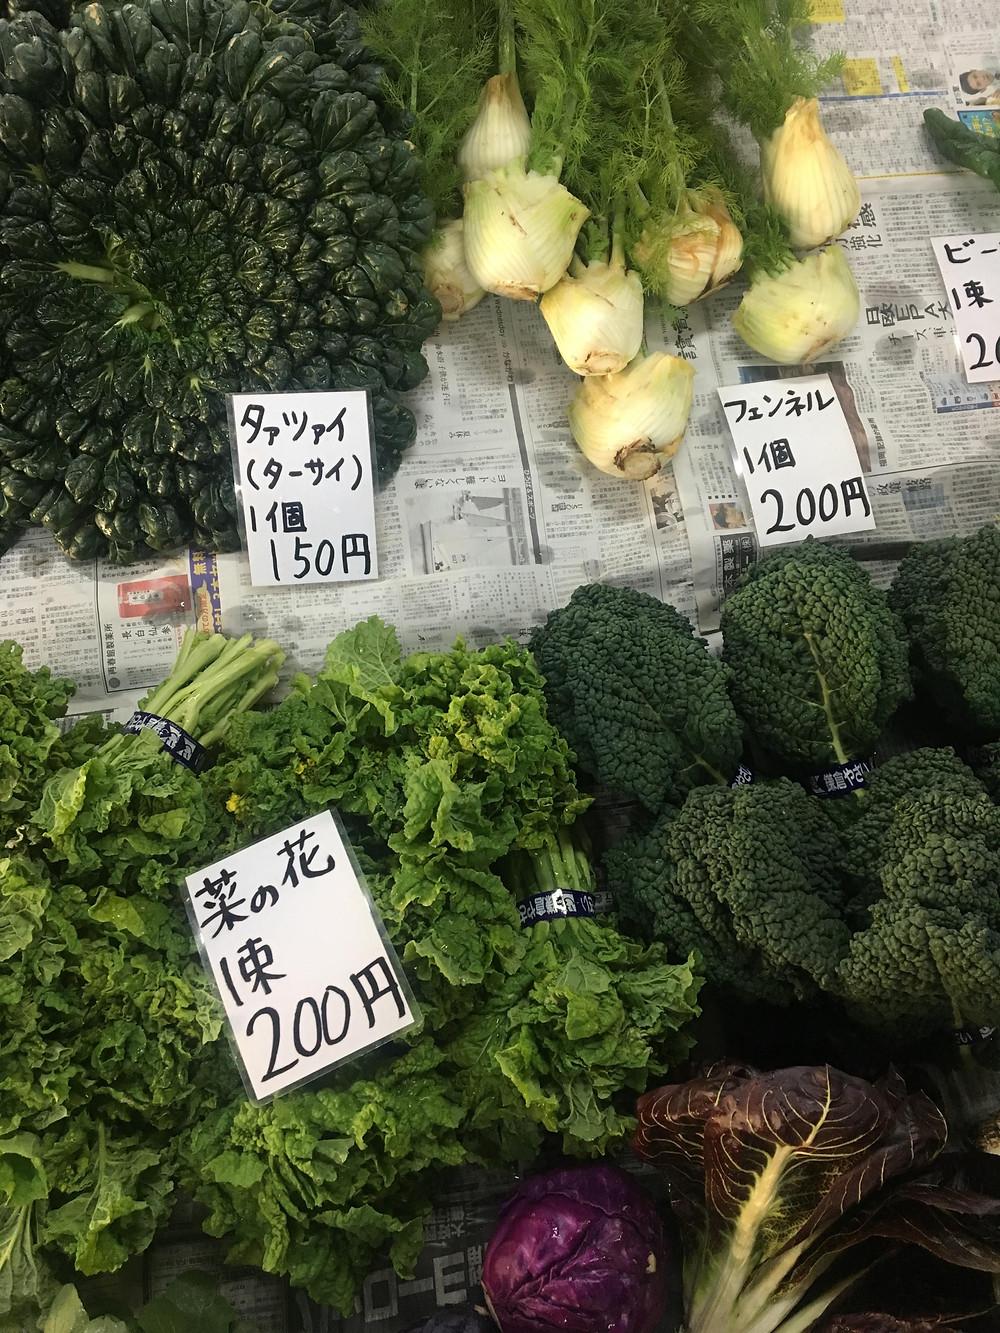 vanlifejapan, kamakura farmers market, fresh veges